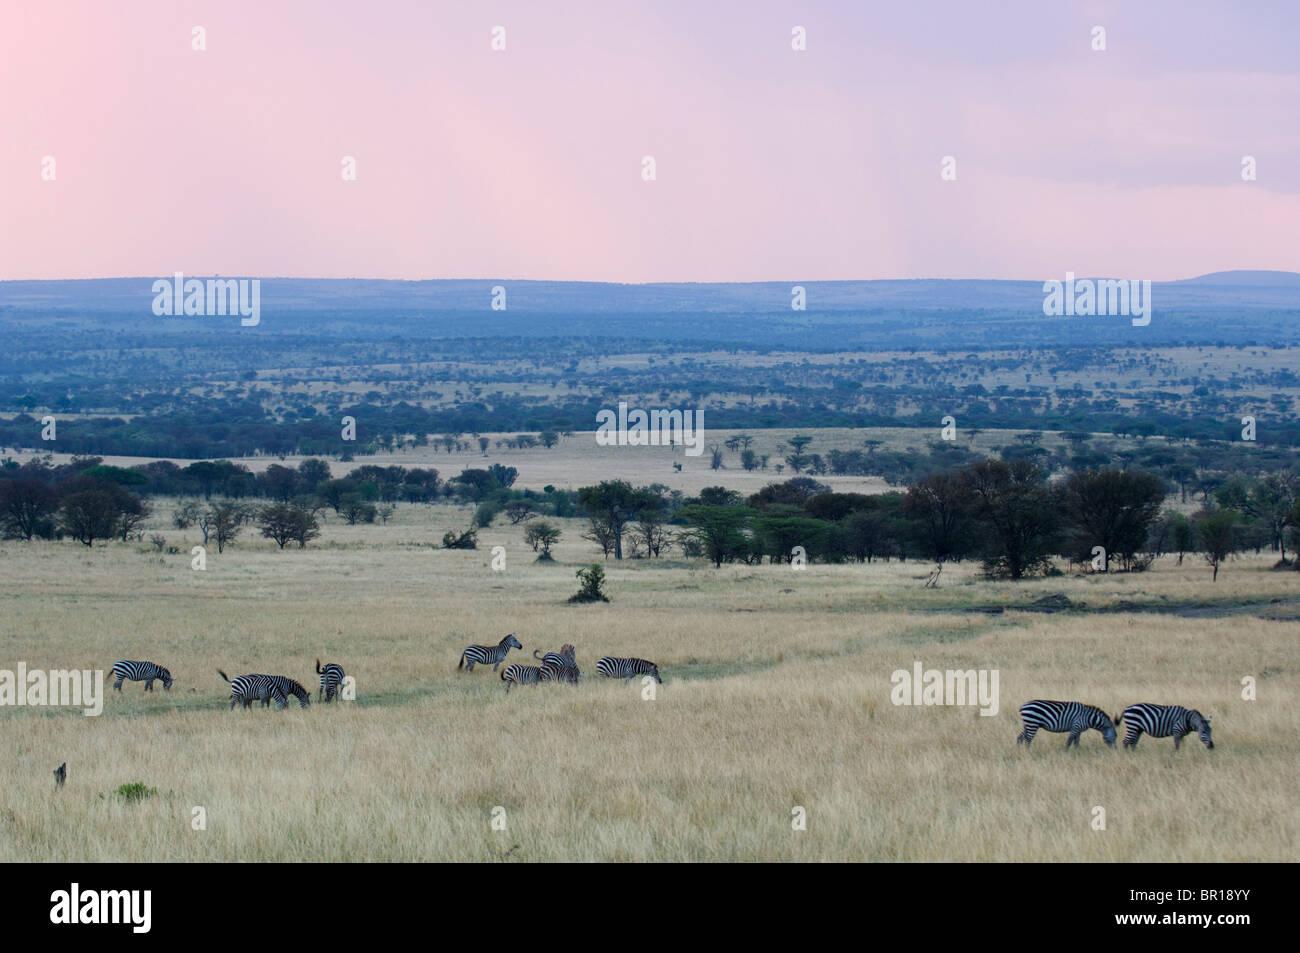 Burchell's zebra (Equus burchellii), Serengeti National Park, Tanzania - Stock Image